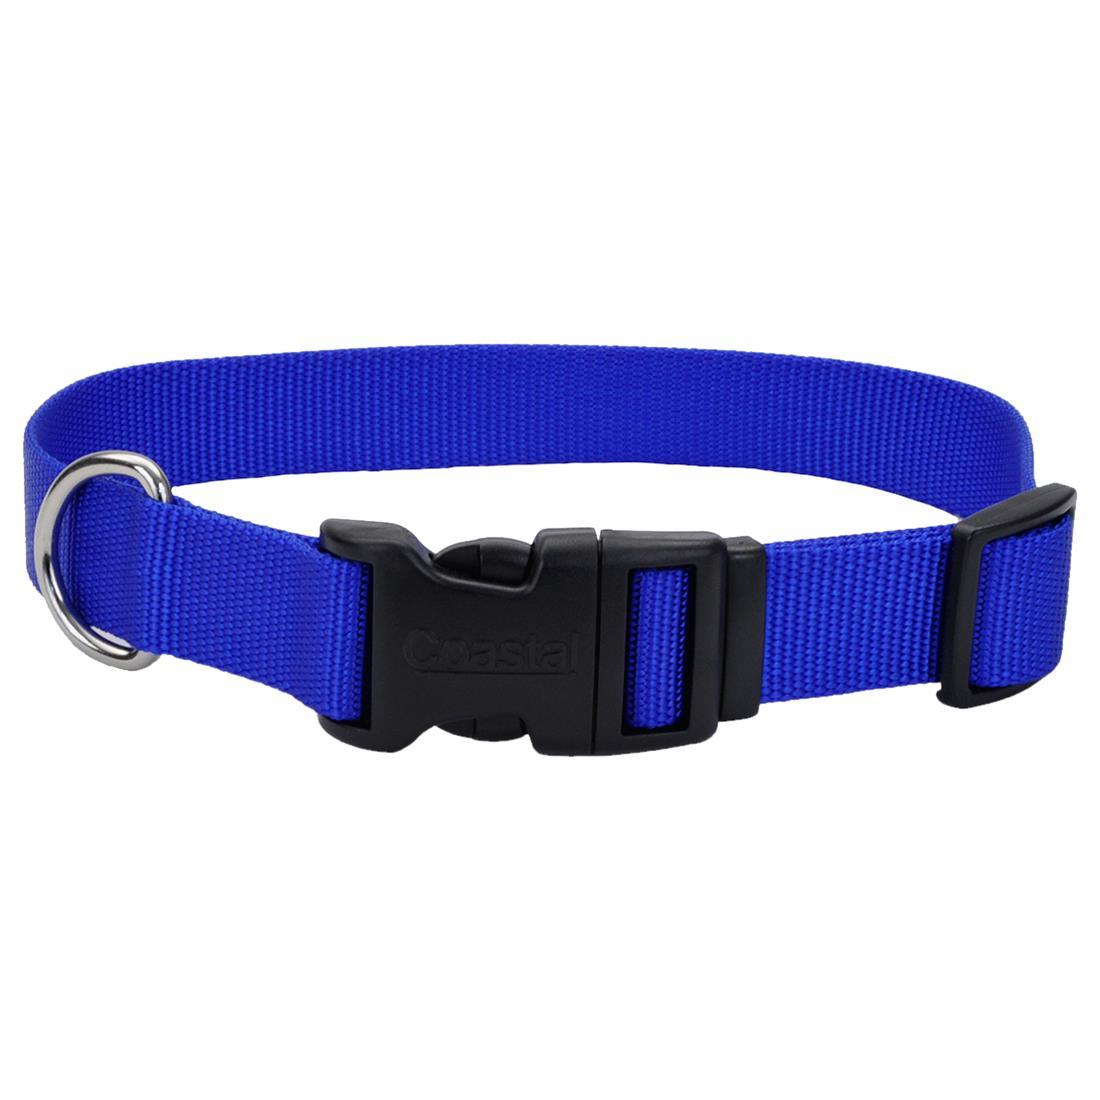 Lock Add On To Dog Collar